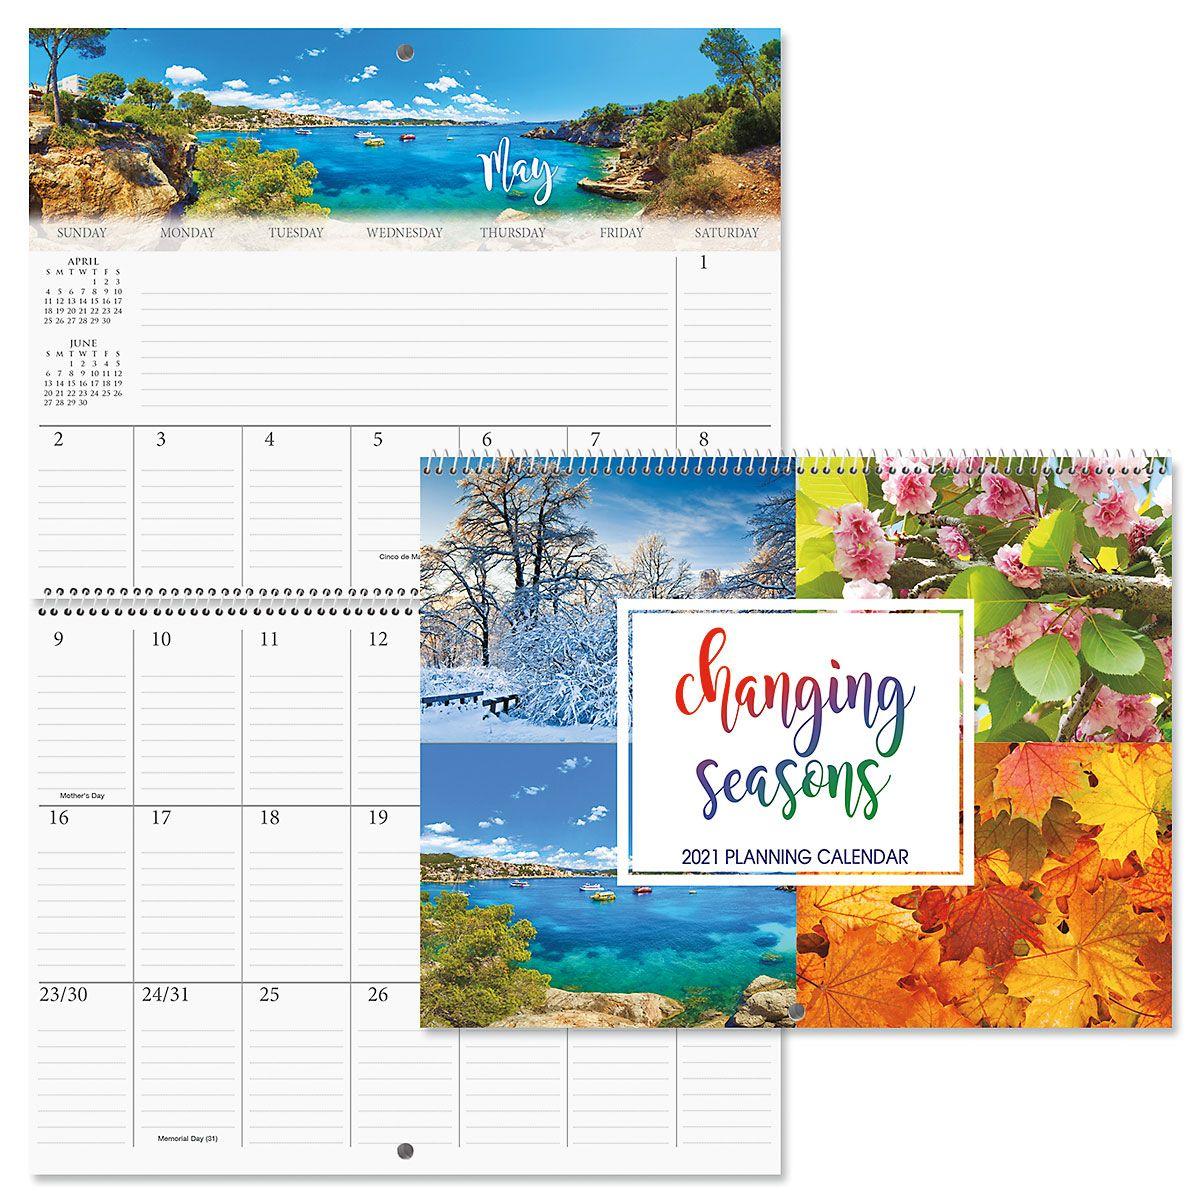 2021 Changing Seasons Big Grid Planning Calendar